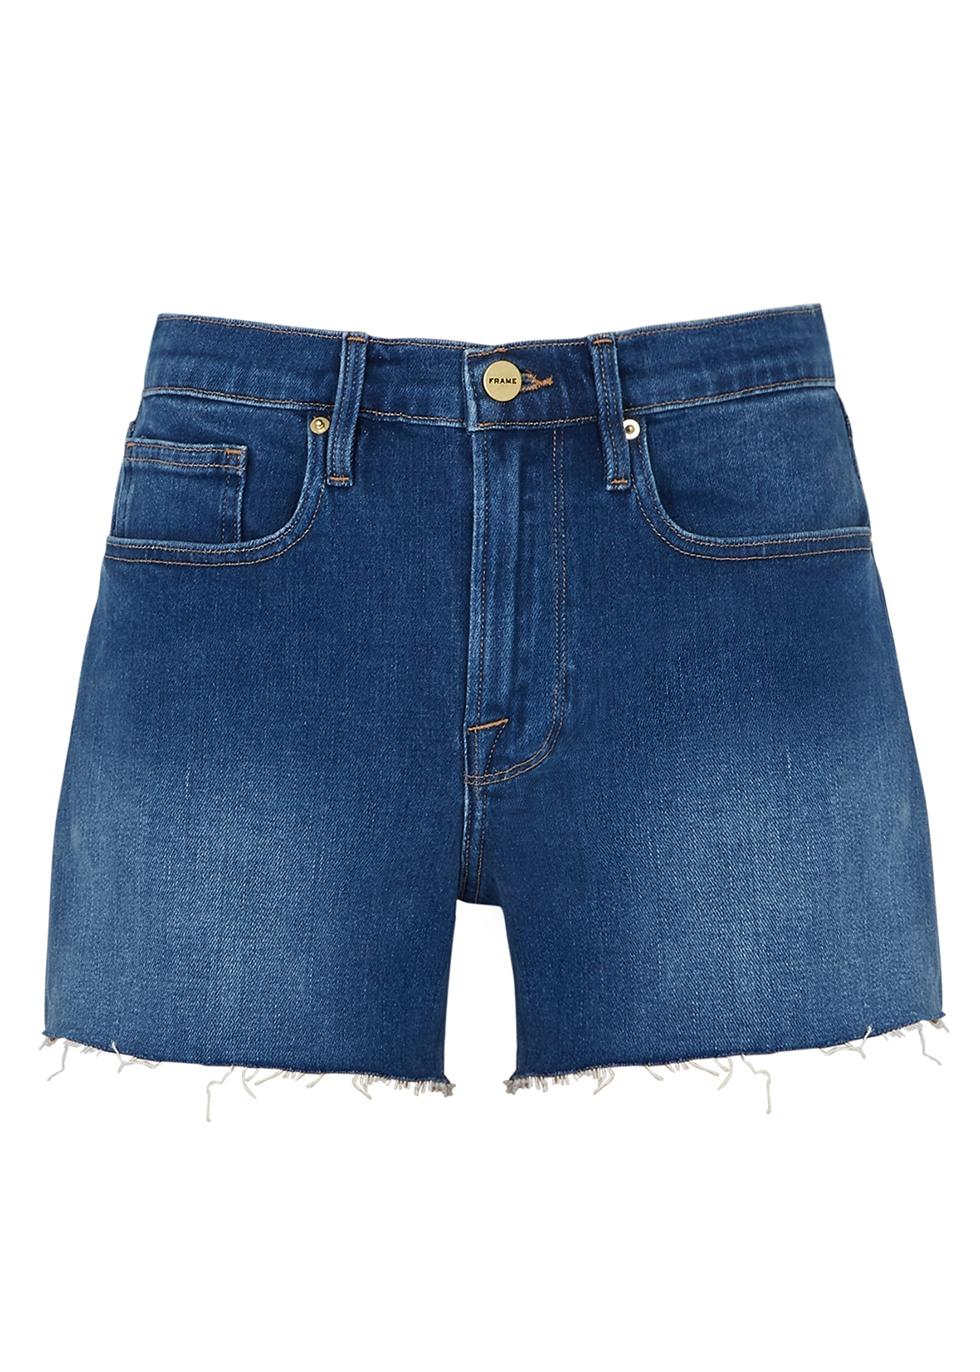 Bridgette distressed stretch-denim shorts - Frame Denim